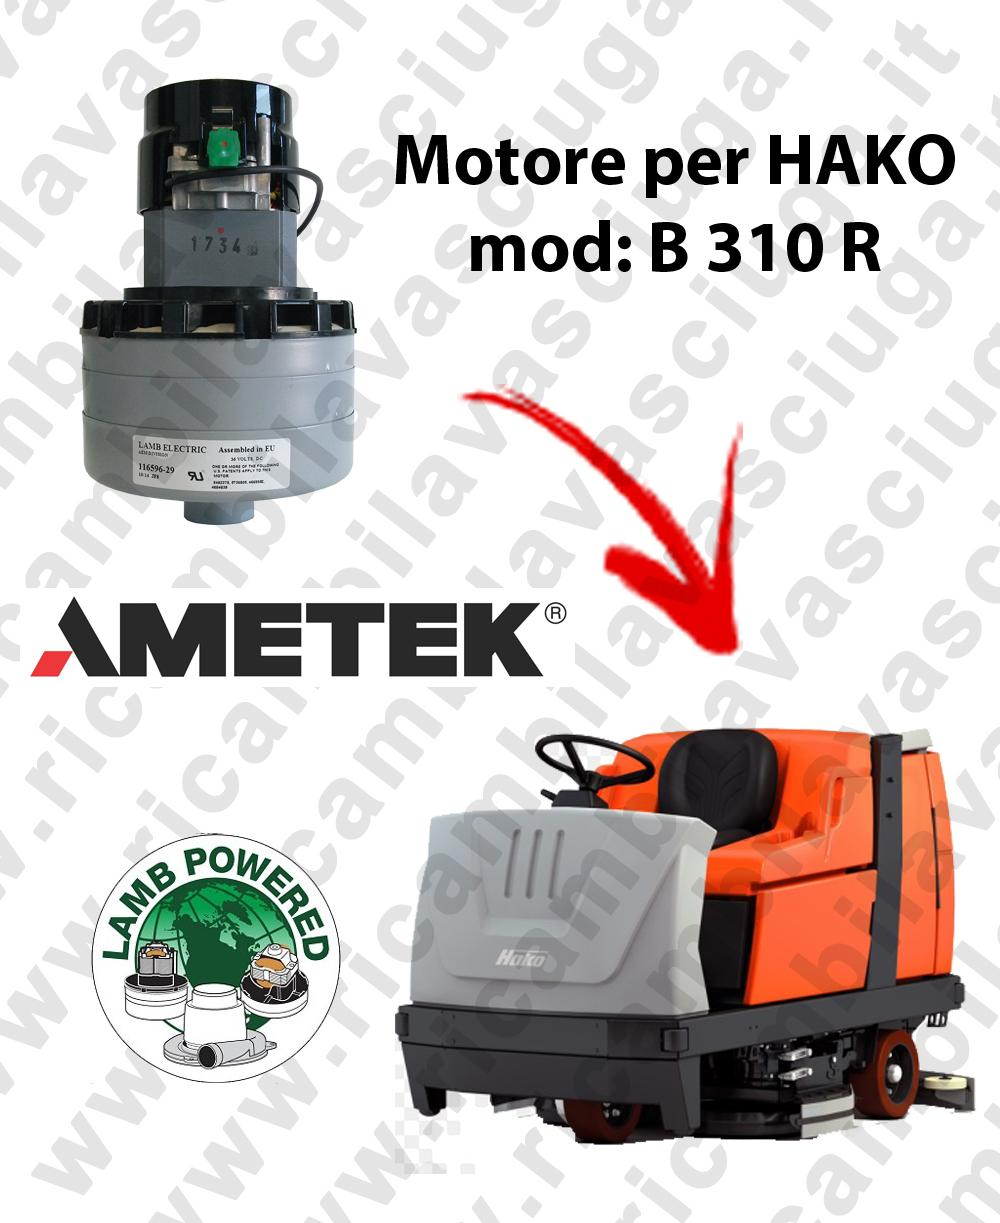 B 310 R MOTORE LAMB AMETEK di aspirazione per lavapavimenti HAKO